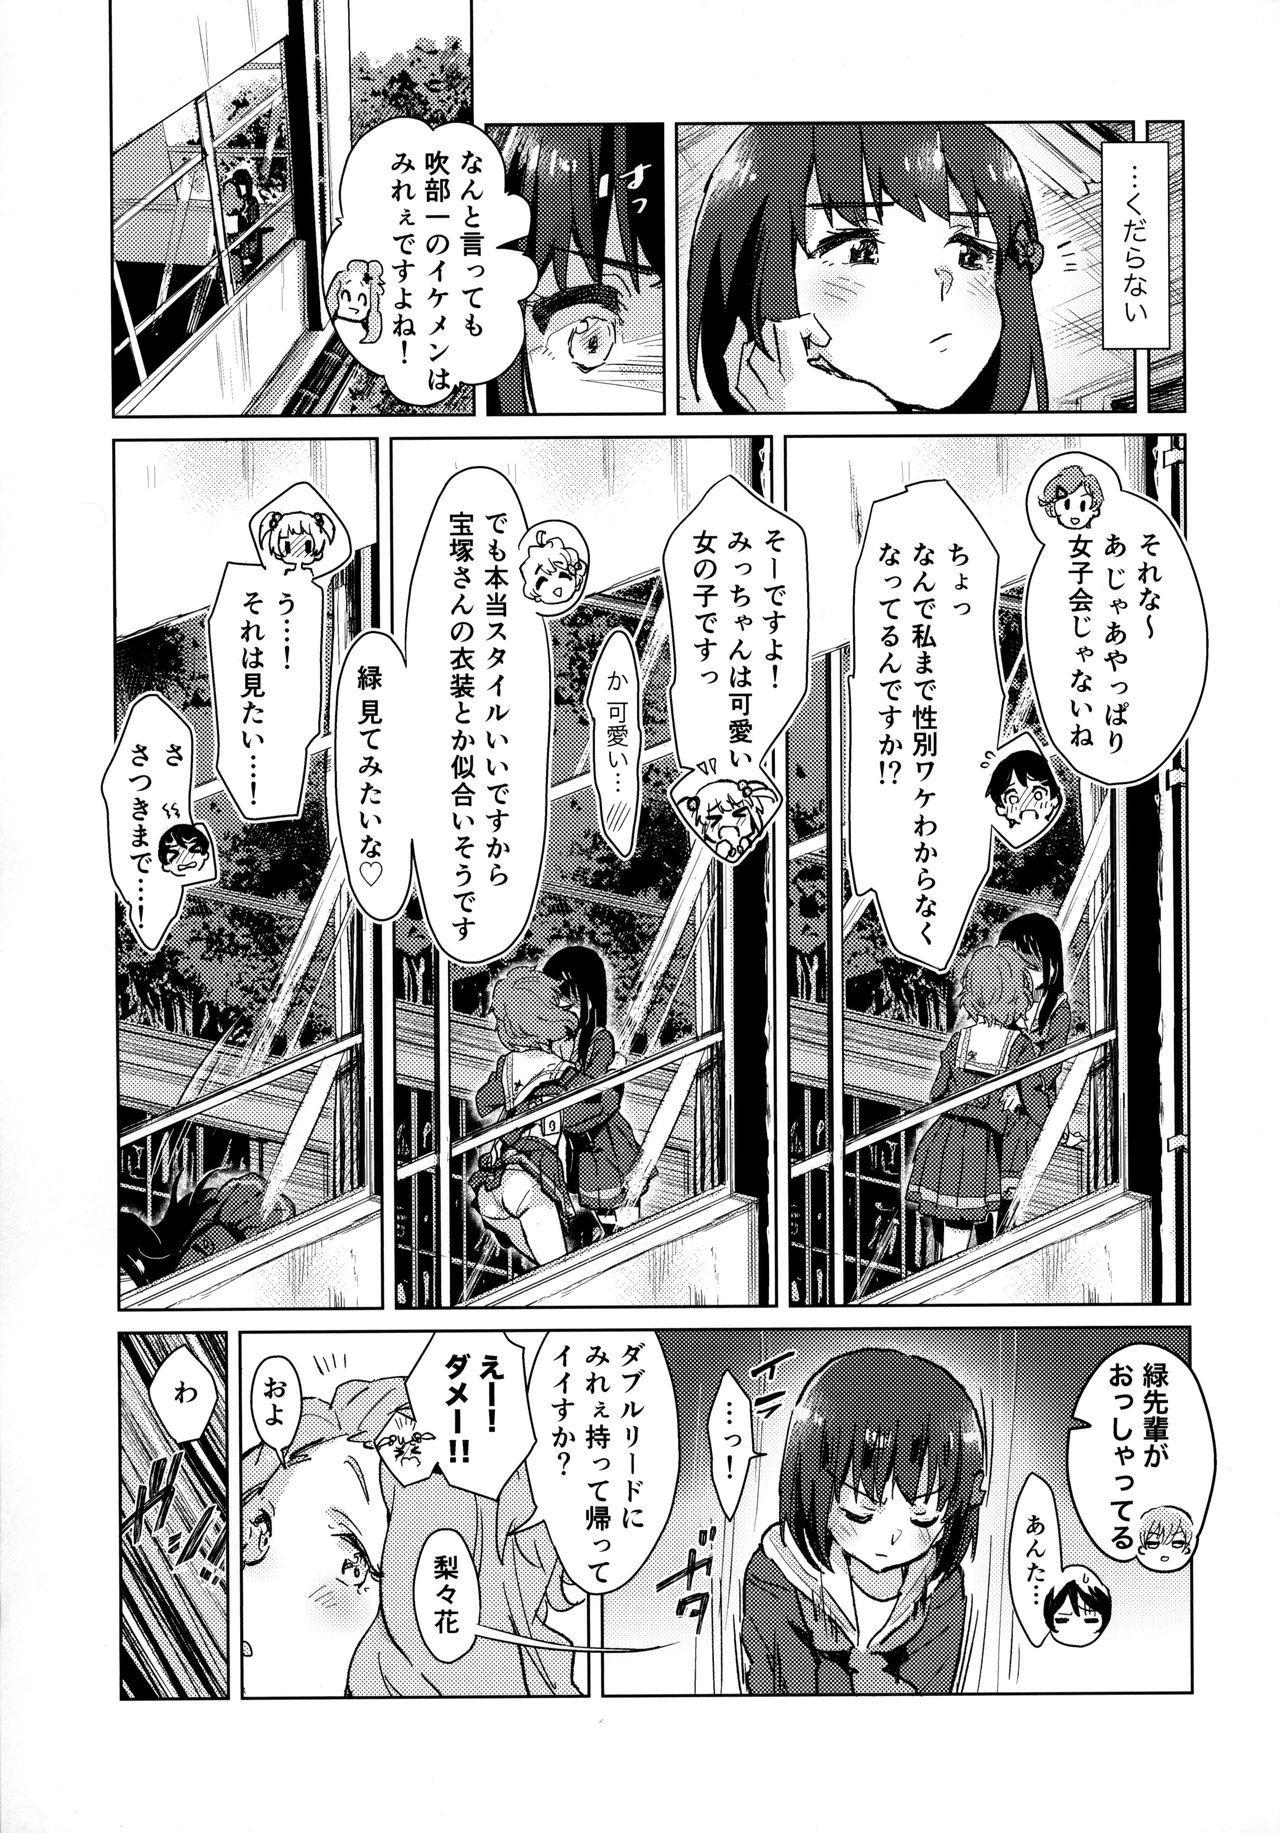 Hisaishi Kanade no Bousou - The Rampage of Kanade Hisaishi 11